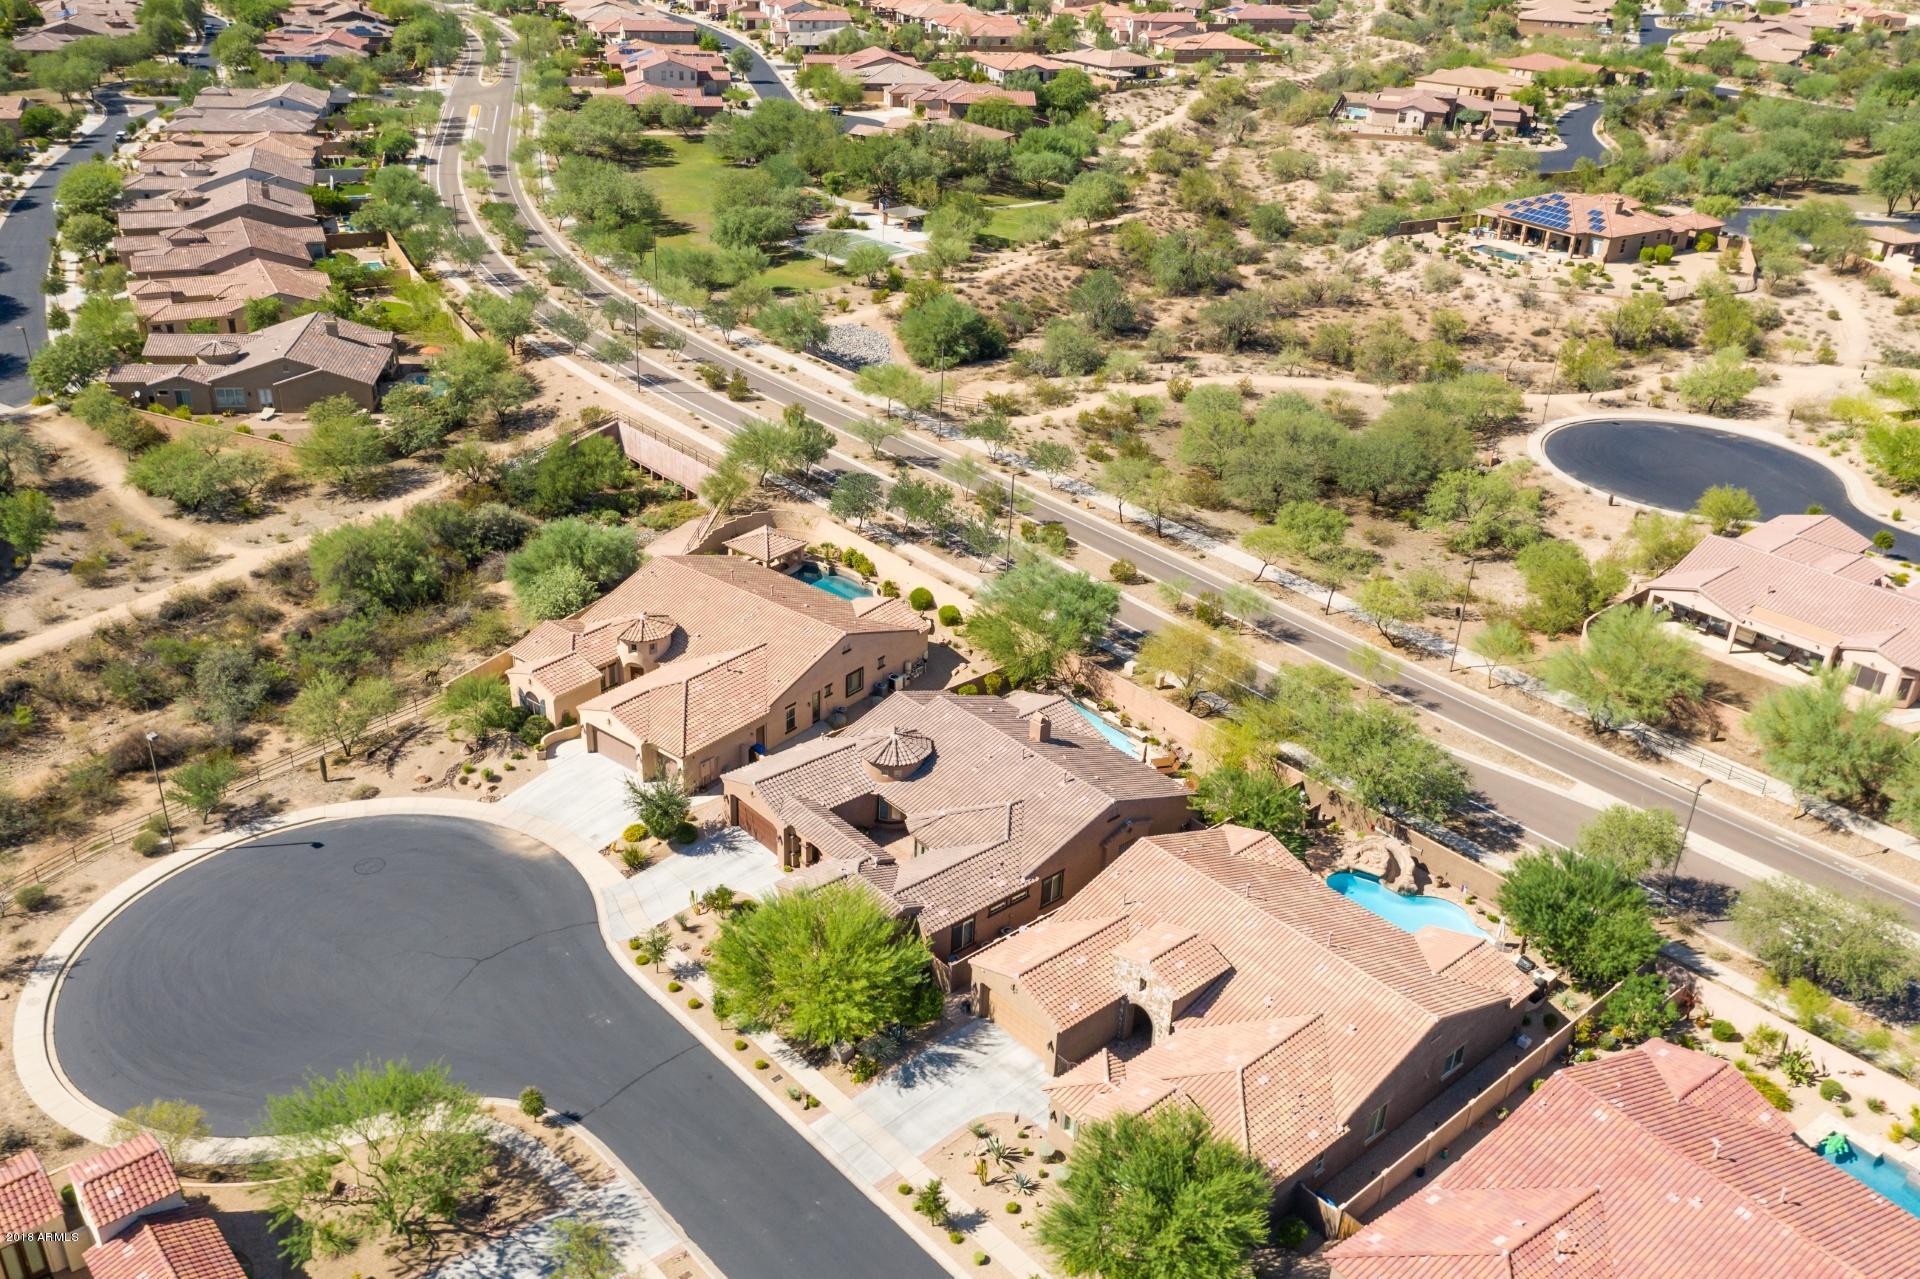 MLS 5828699 1616 W SIERRA SUNSET Trail, Phoenix, AZ 85085 Phoenix AZ Sonoran Foothills